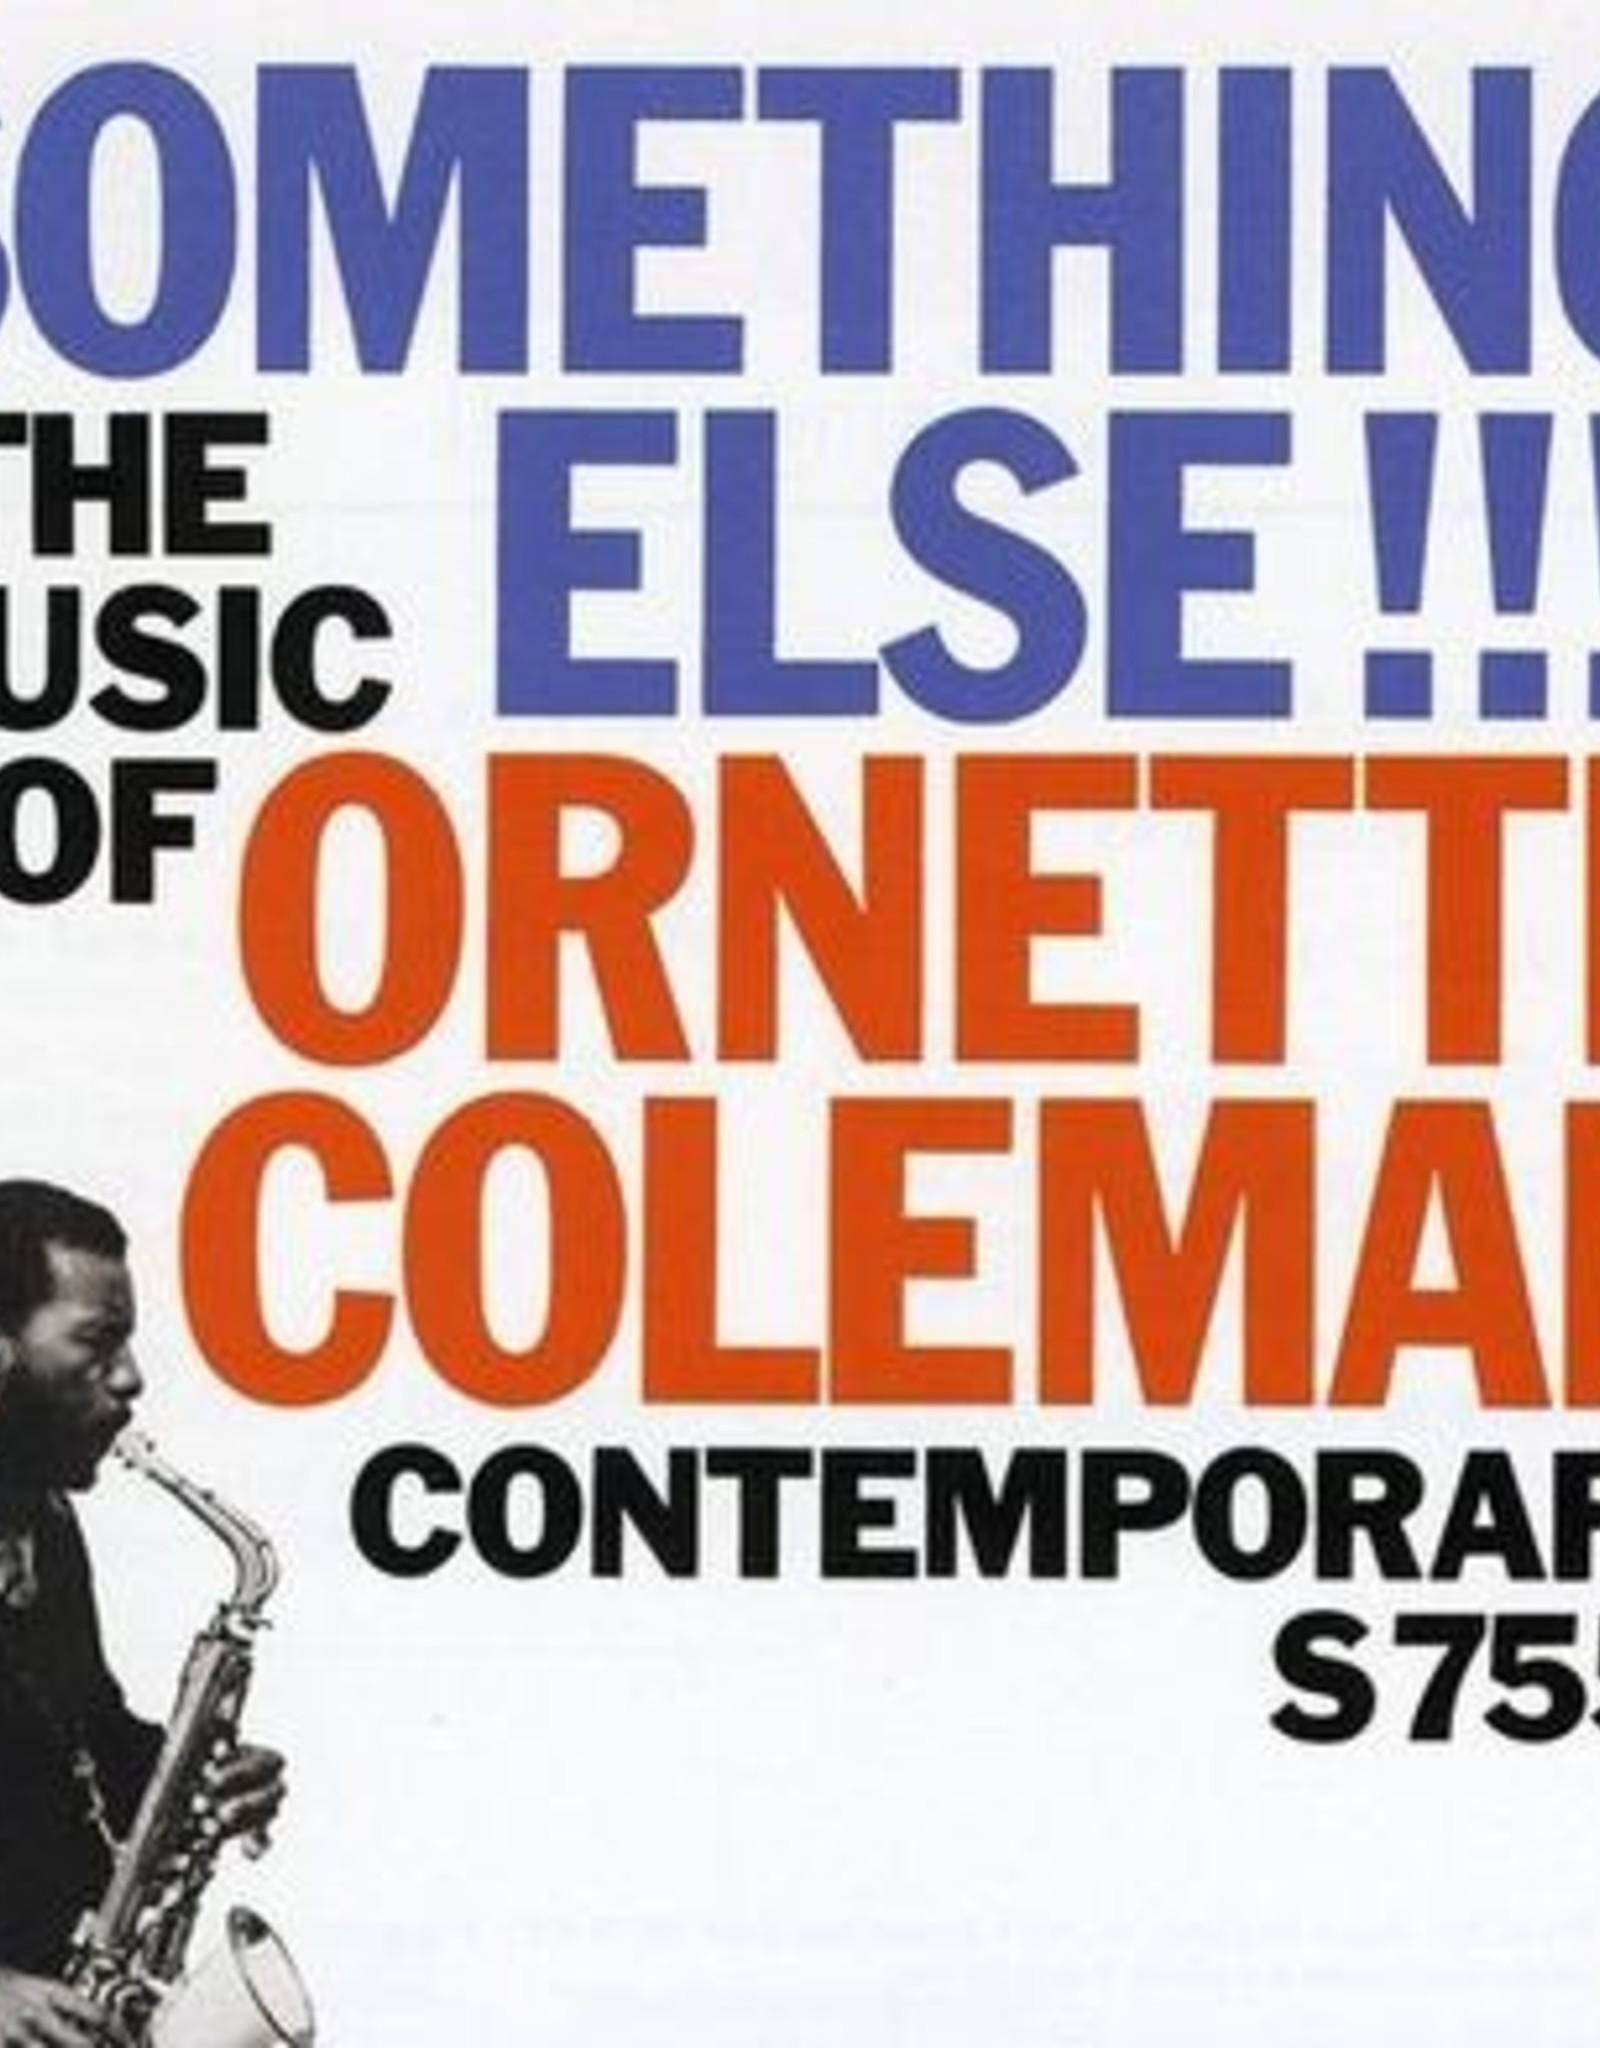 Ornette Coleman - The Music Of Ornette Coleman: Something Else